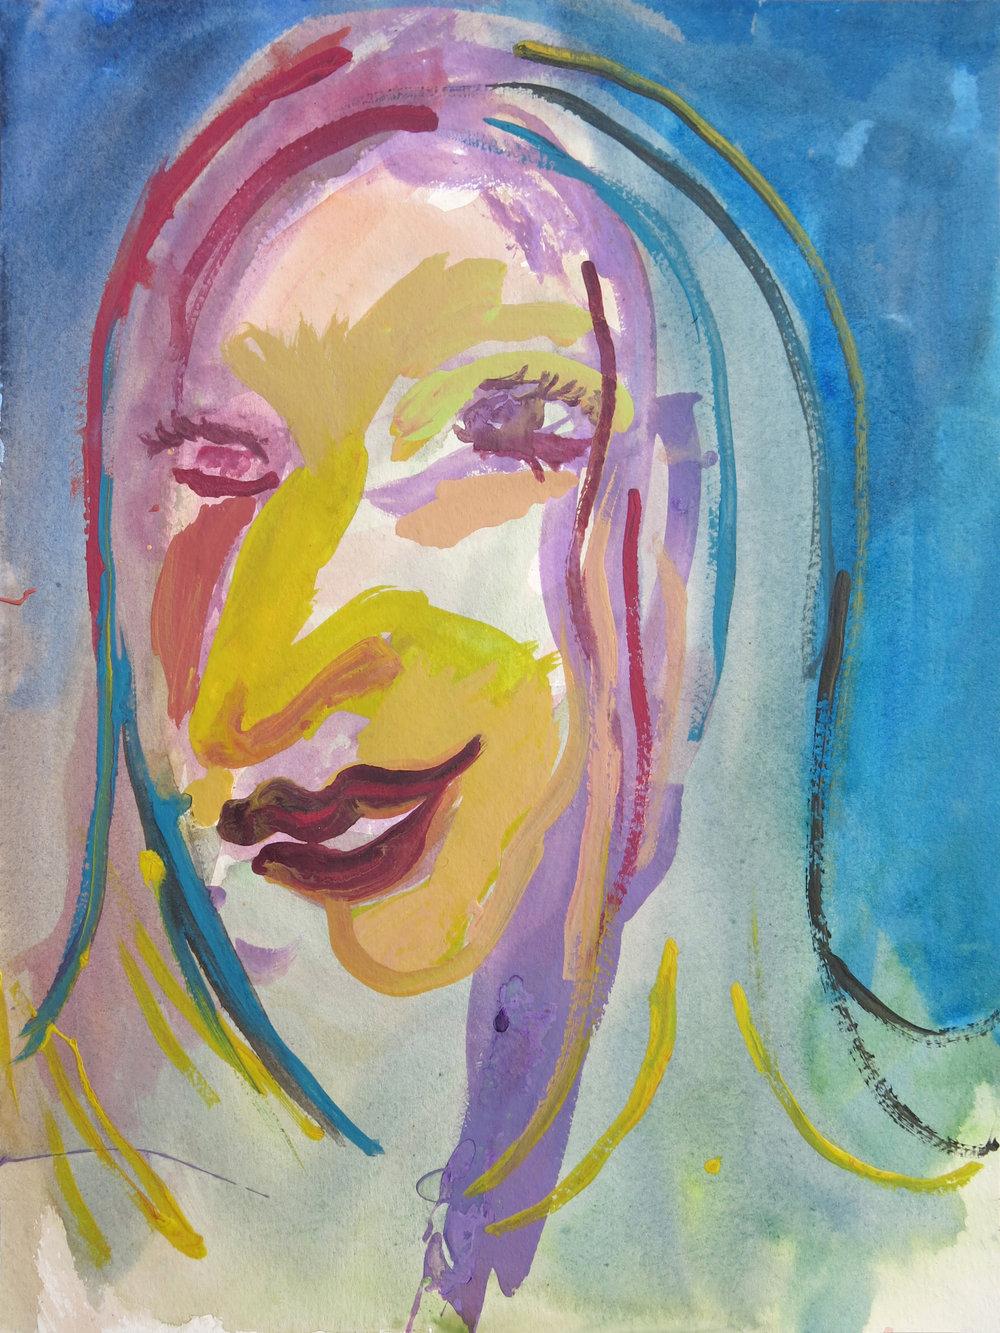 Barbra Streisand Portrait #3